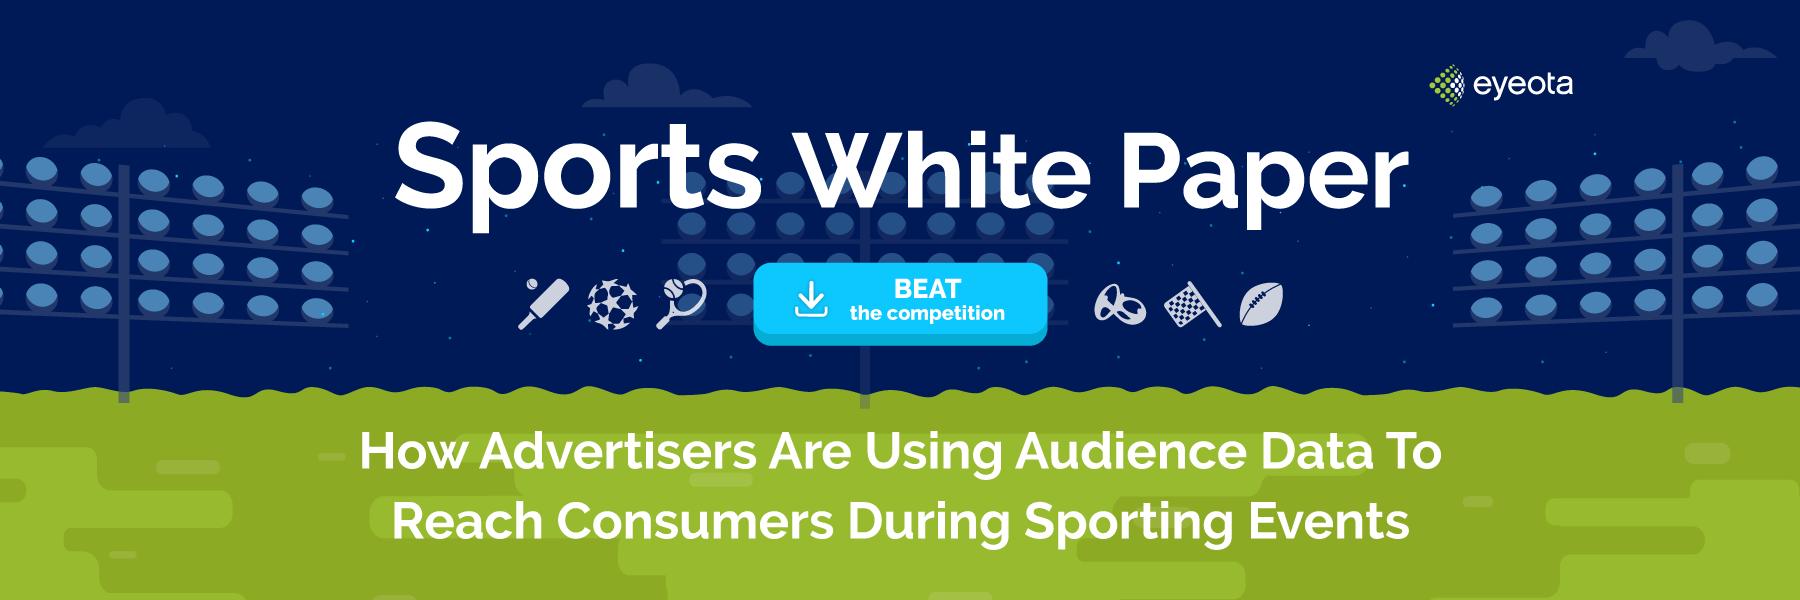 Eyeota Sports White Paper